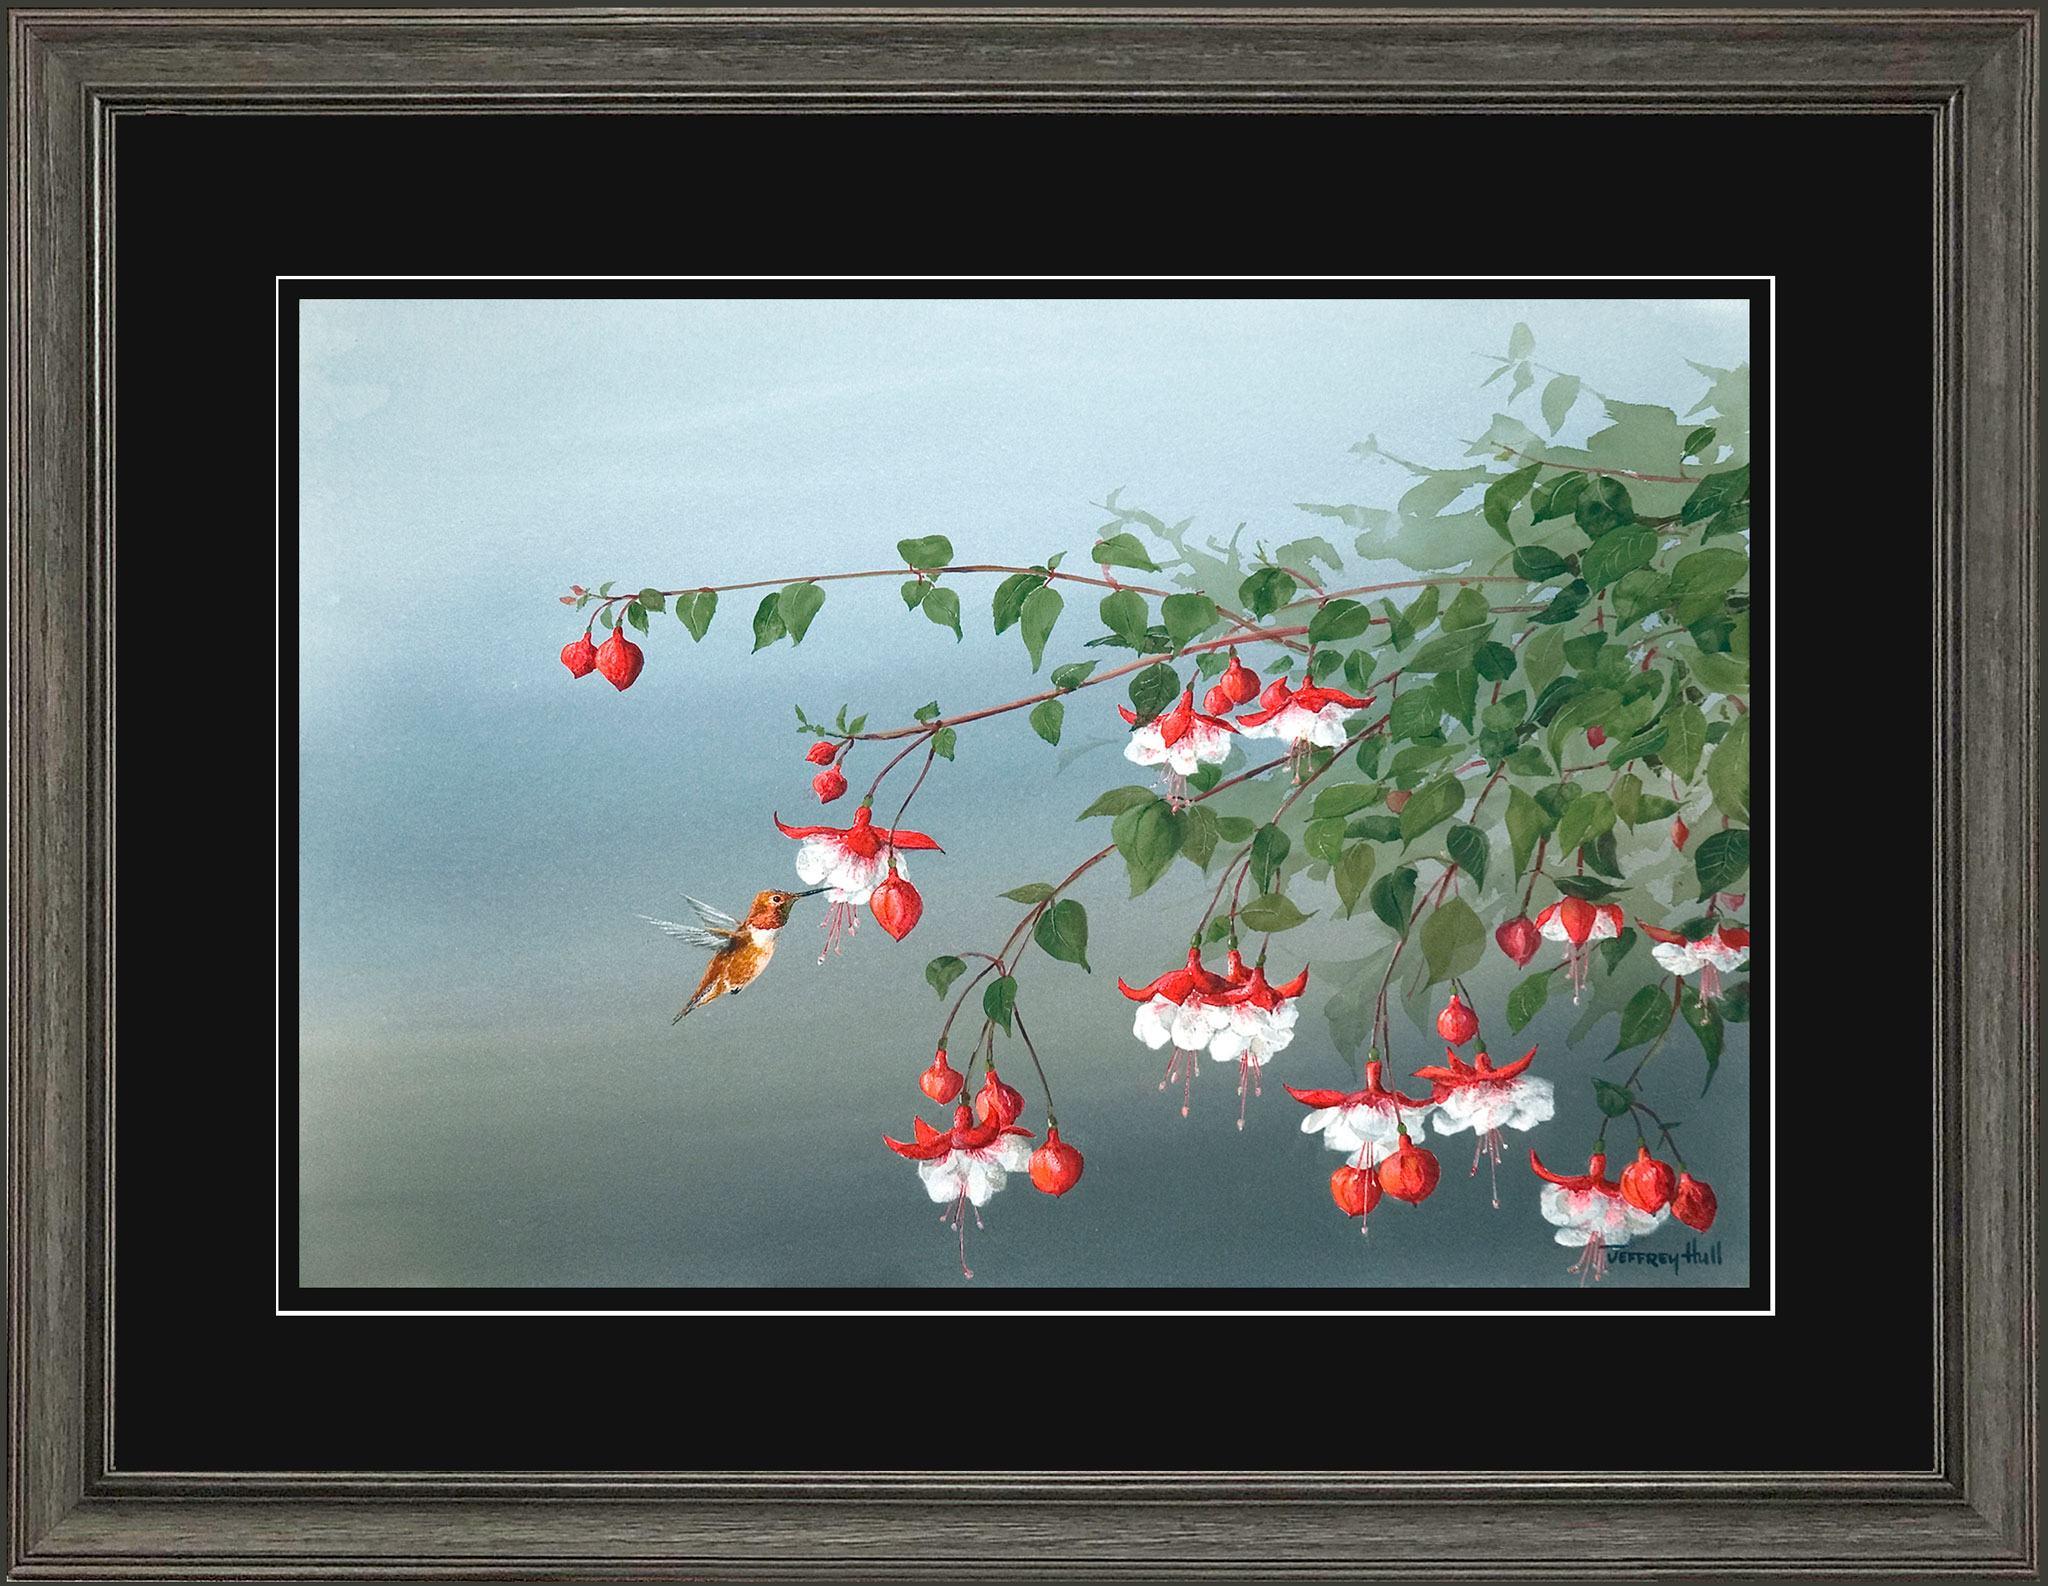 Fuchsia-Blossoms-LimEd-Cascade-Jet-Black-4-Website-2021